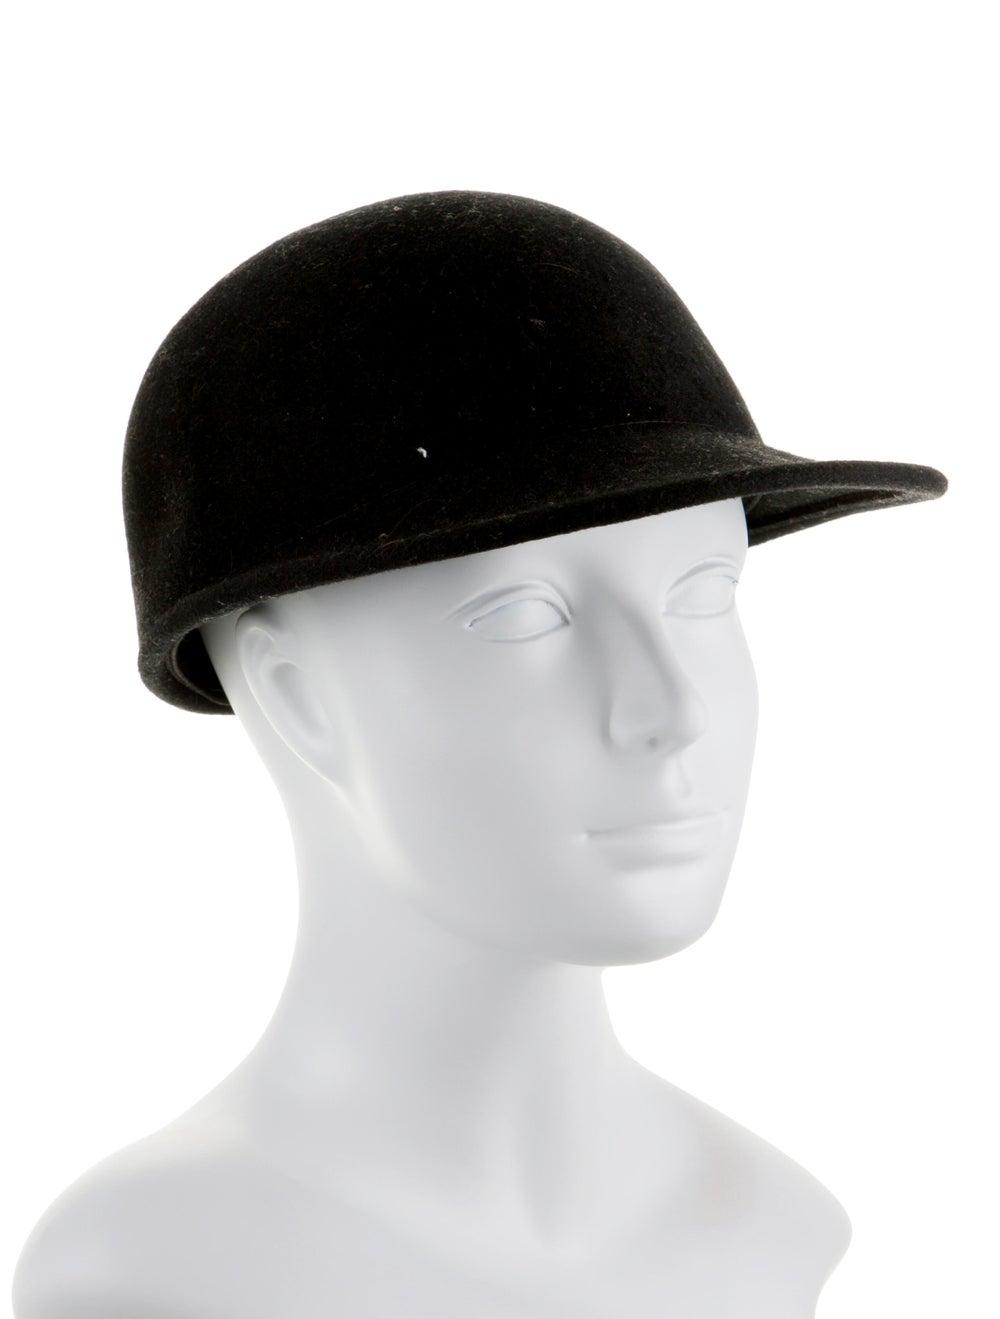 Janessa Leone Wool Jockey Hat Black - image 3